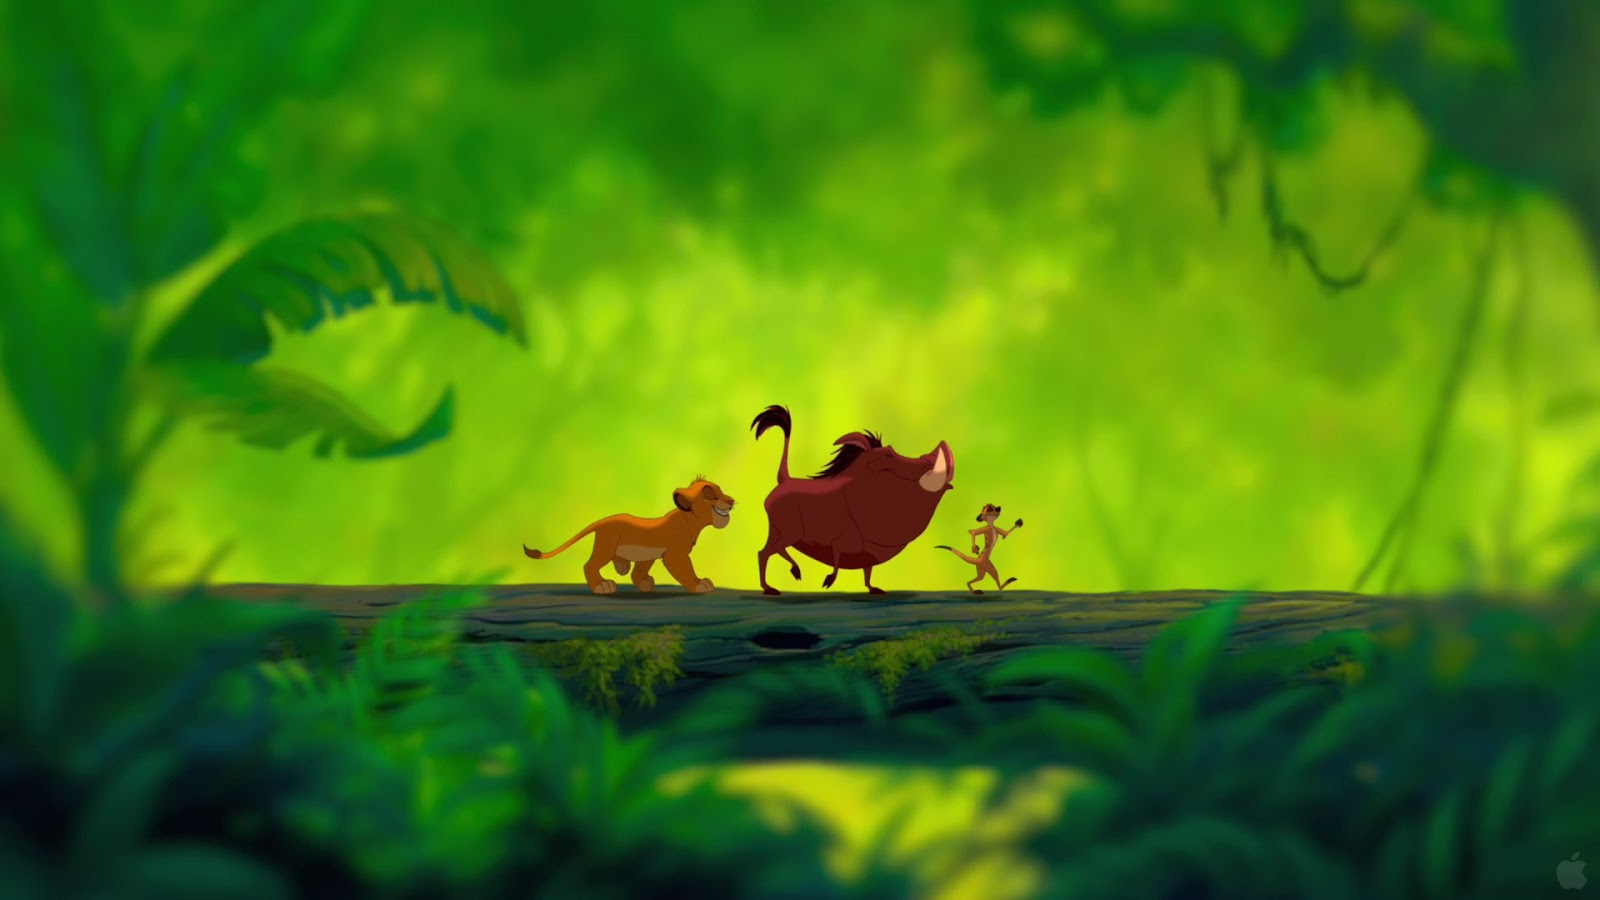 Hd Lion King Wallpaper: Raccolta Sfondi Dedicati Ai Cartoni Animati Classici